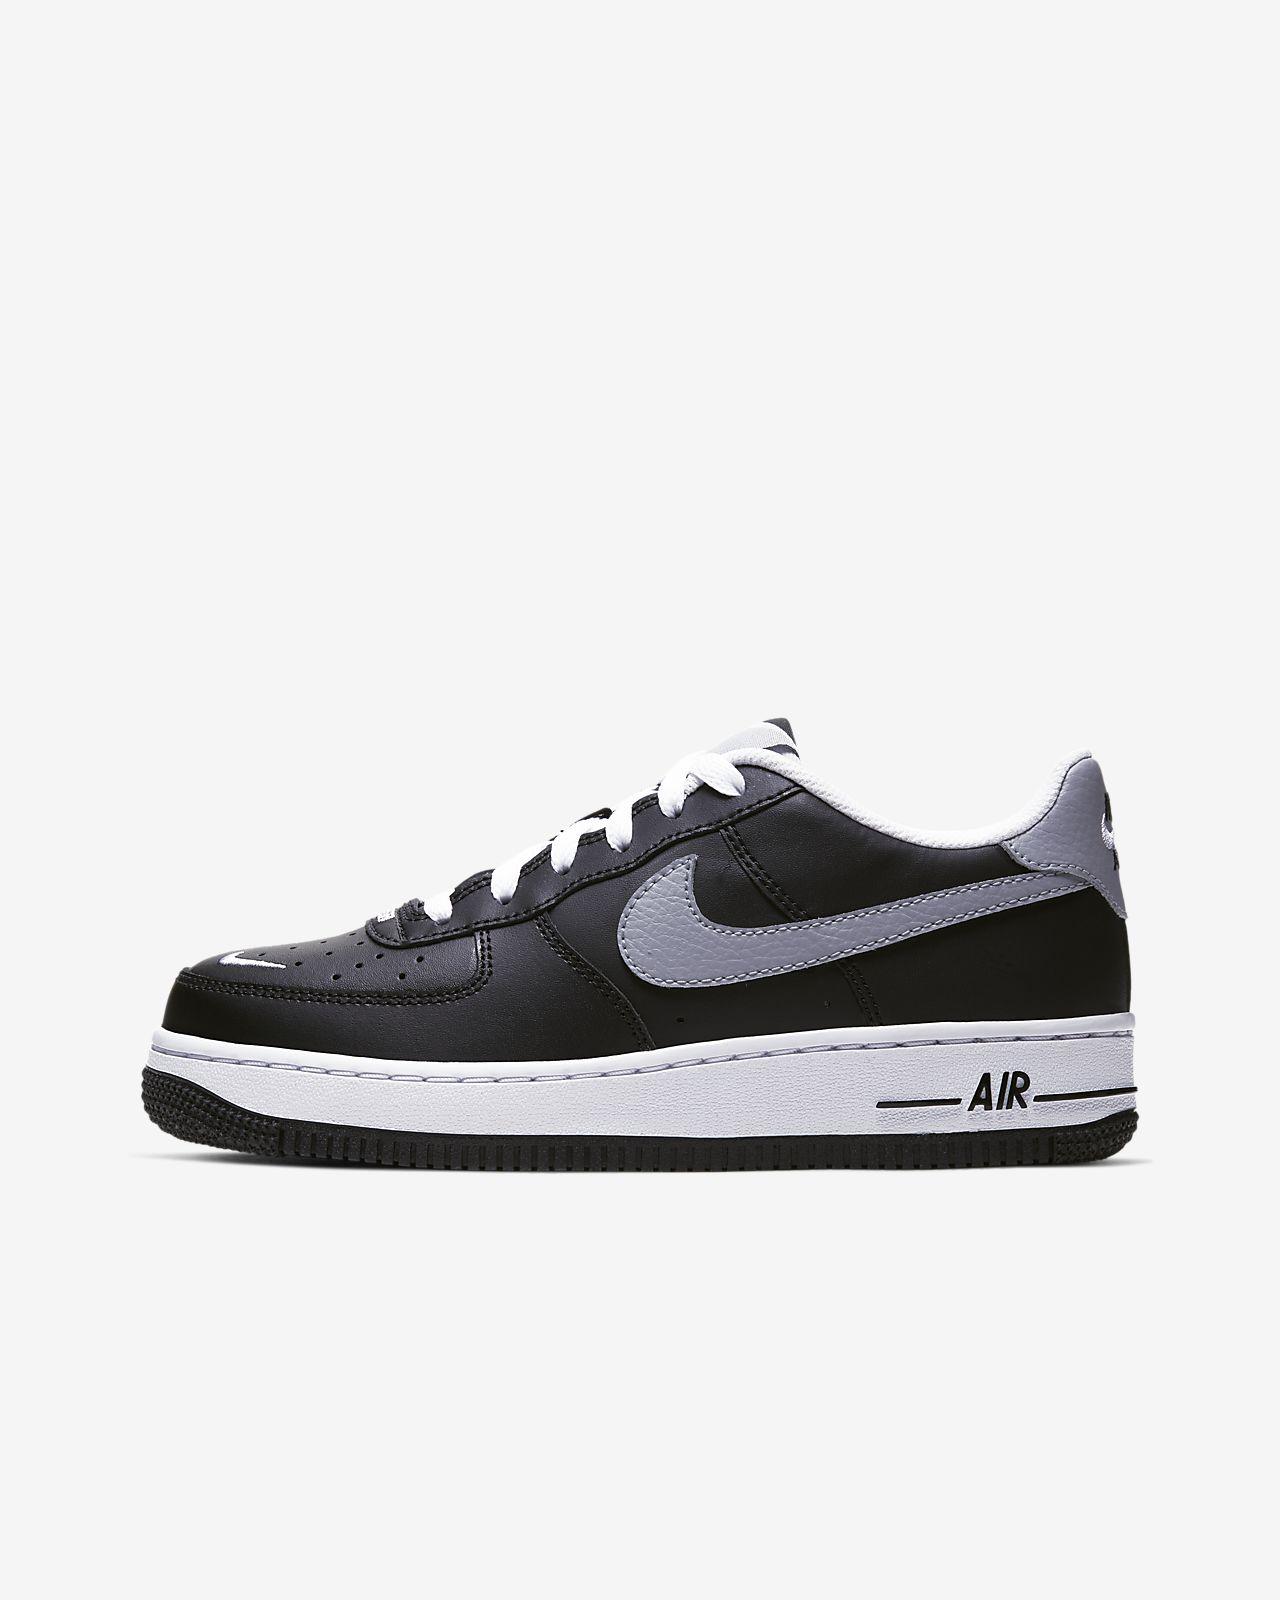 Nike Air Force 1 (AF1) Schuhe und Bekleidung | Haxenclub